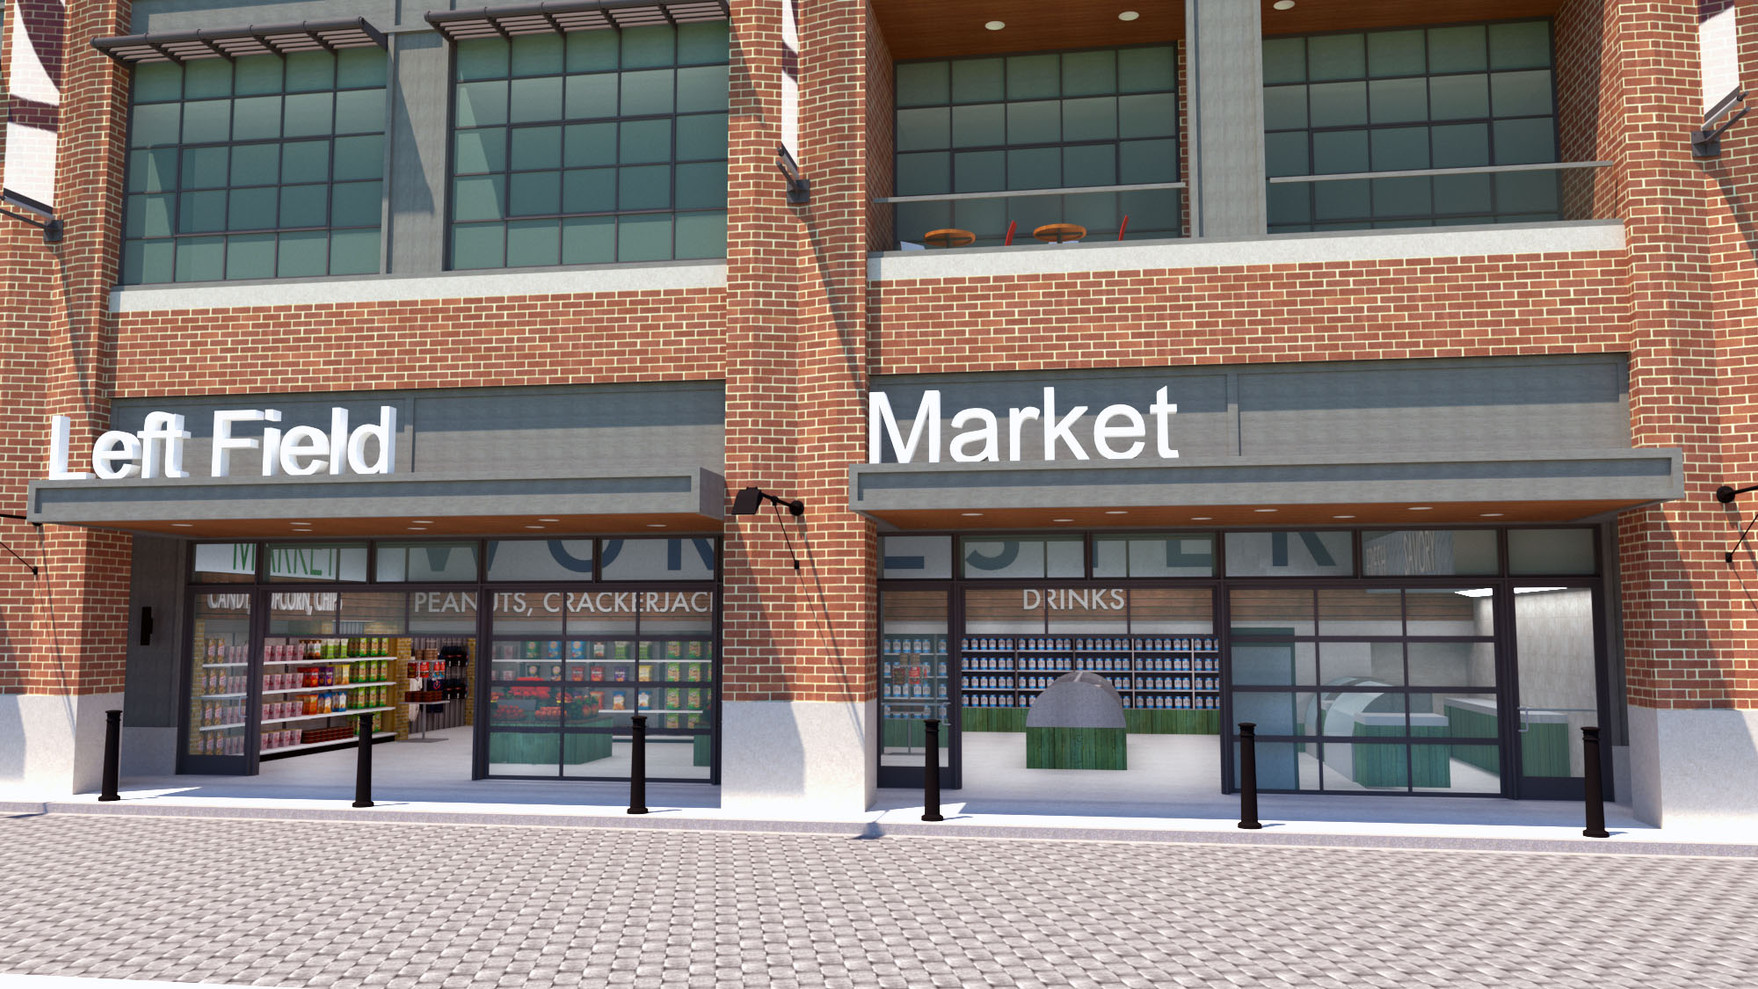 LF Market